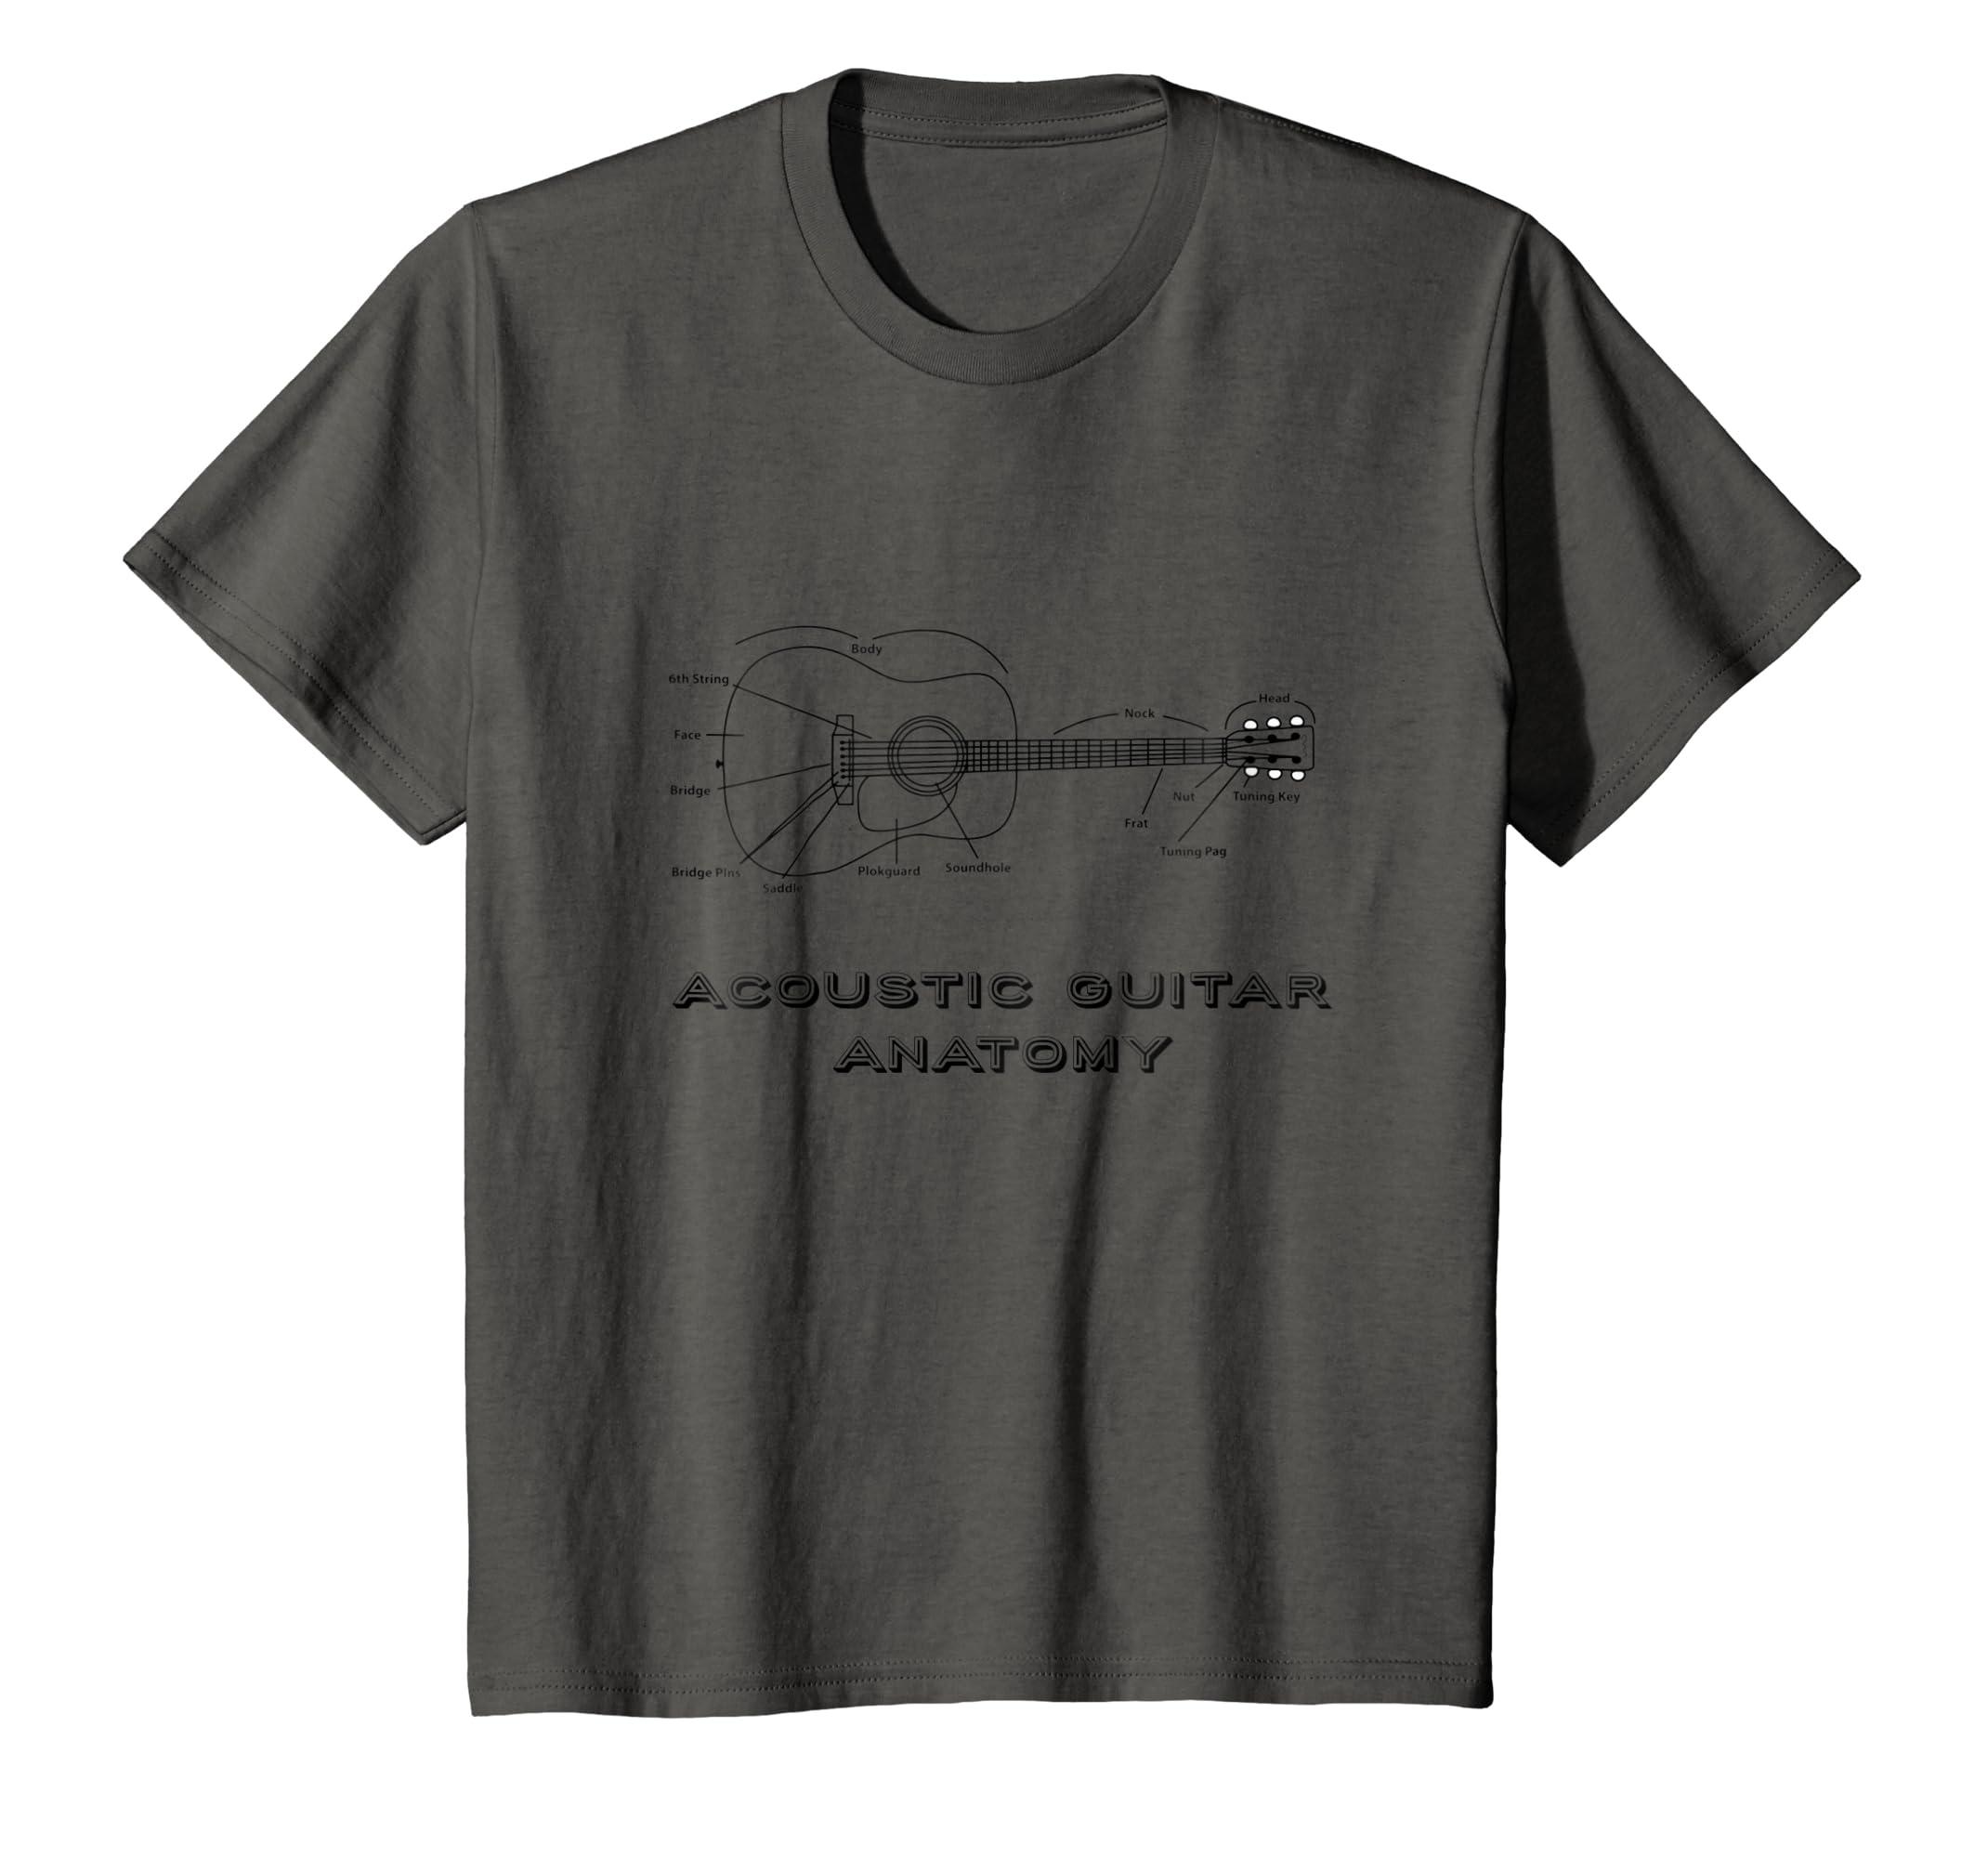 Amazon.com: Acoustic Guitar Anatomy T-Shirt Music Lover Tee Shirt ...